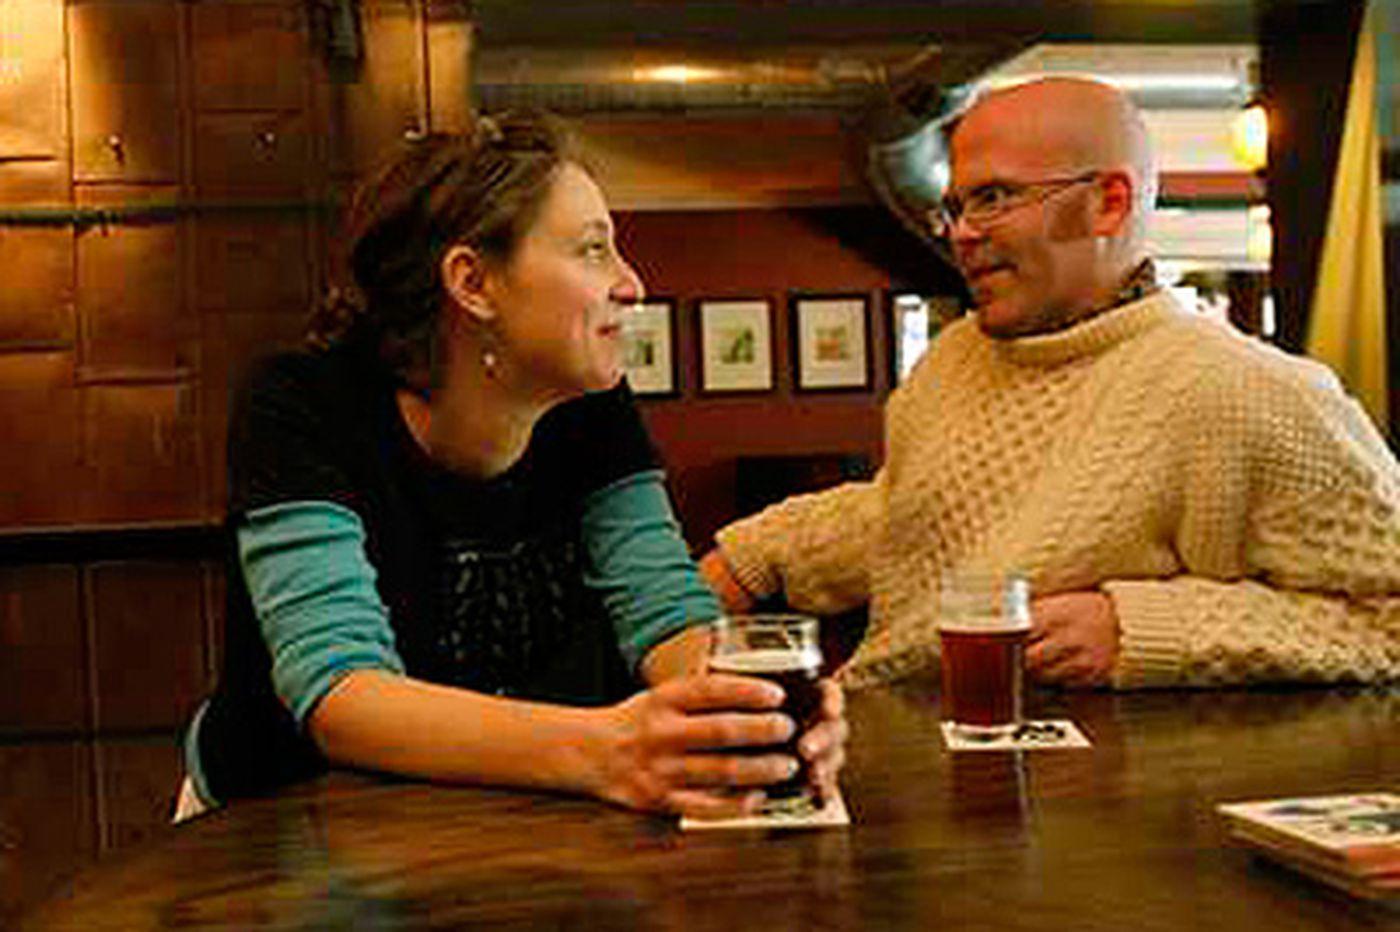 Pol calls beer raid 'ridiculous use of manpower'